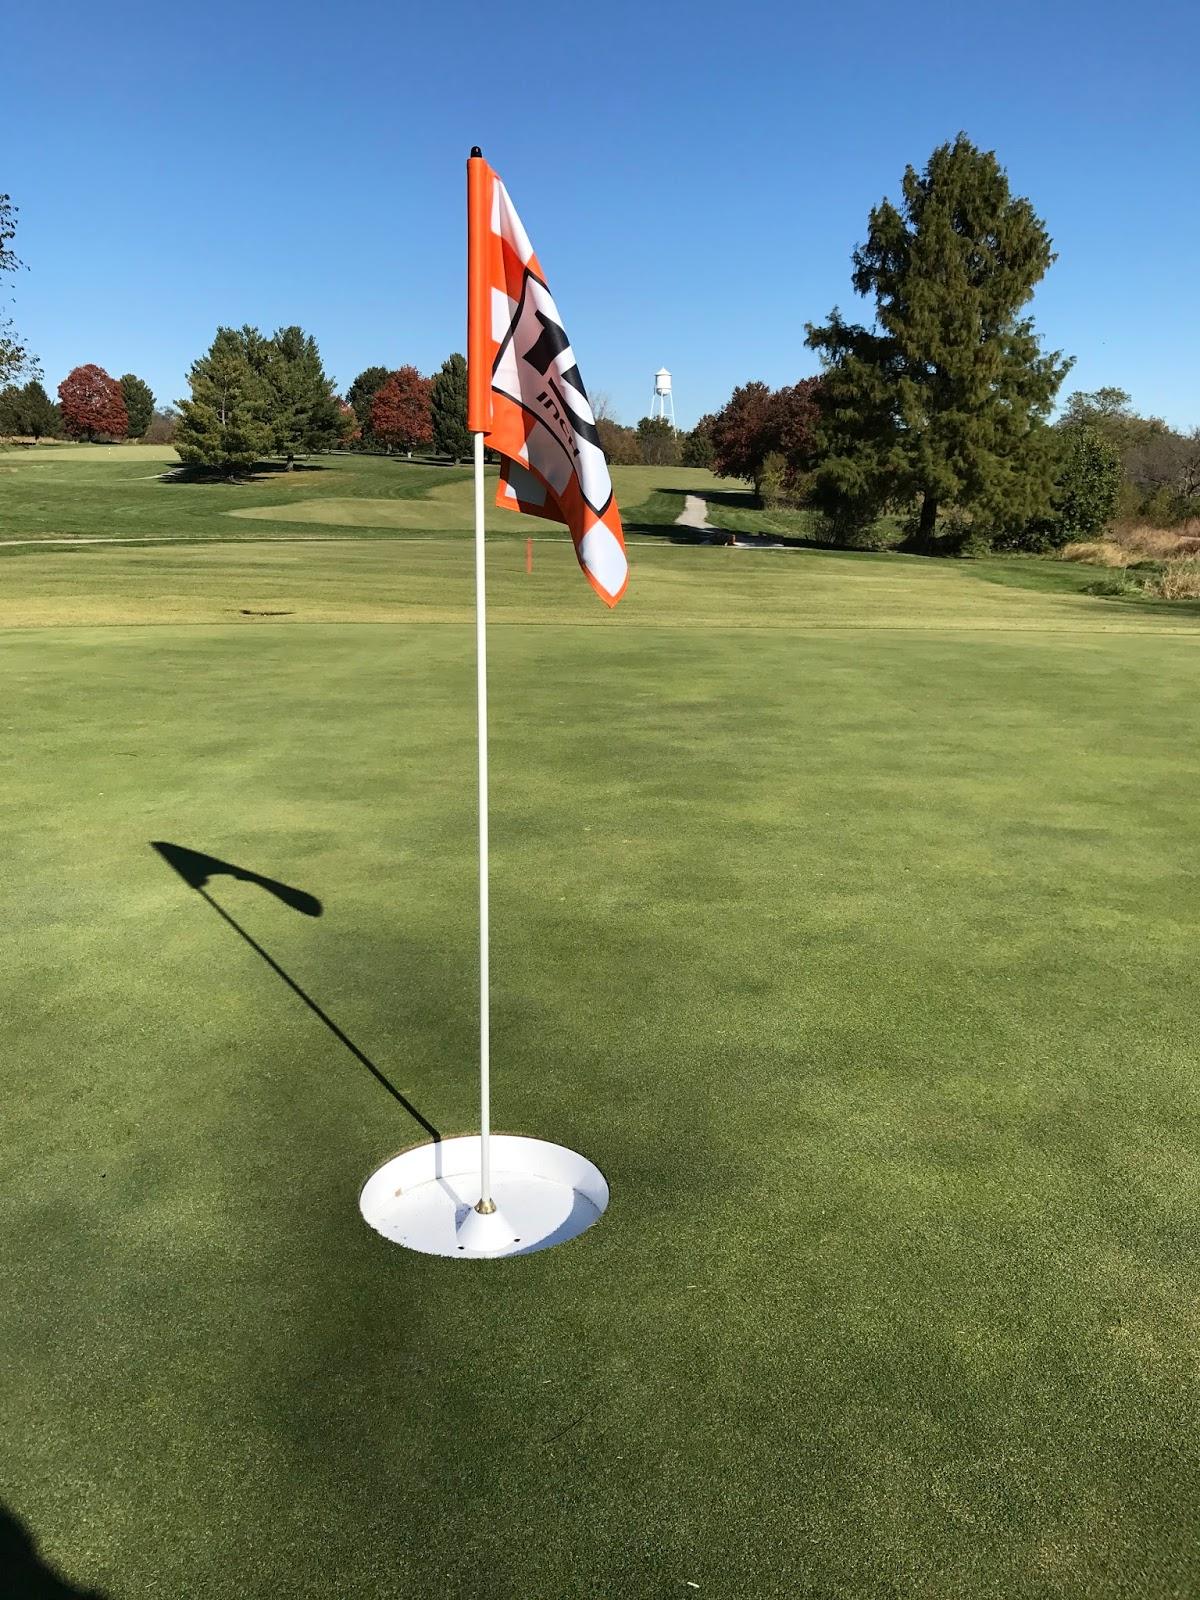 Minor park golf course maintenance